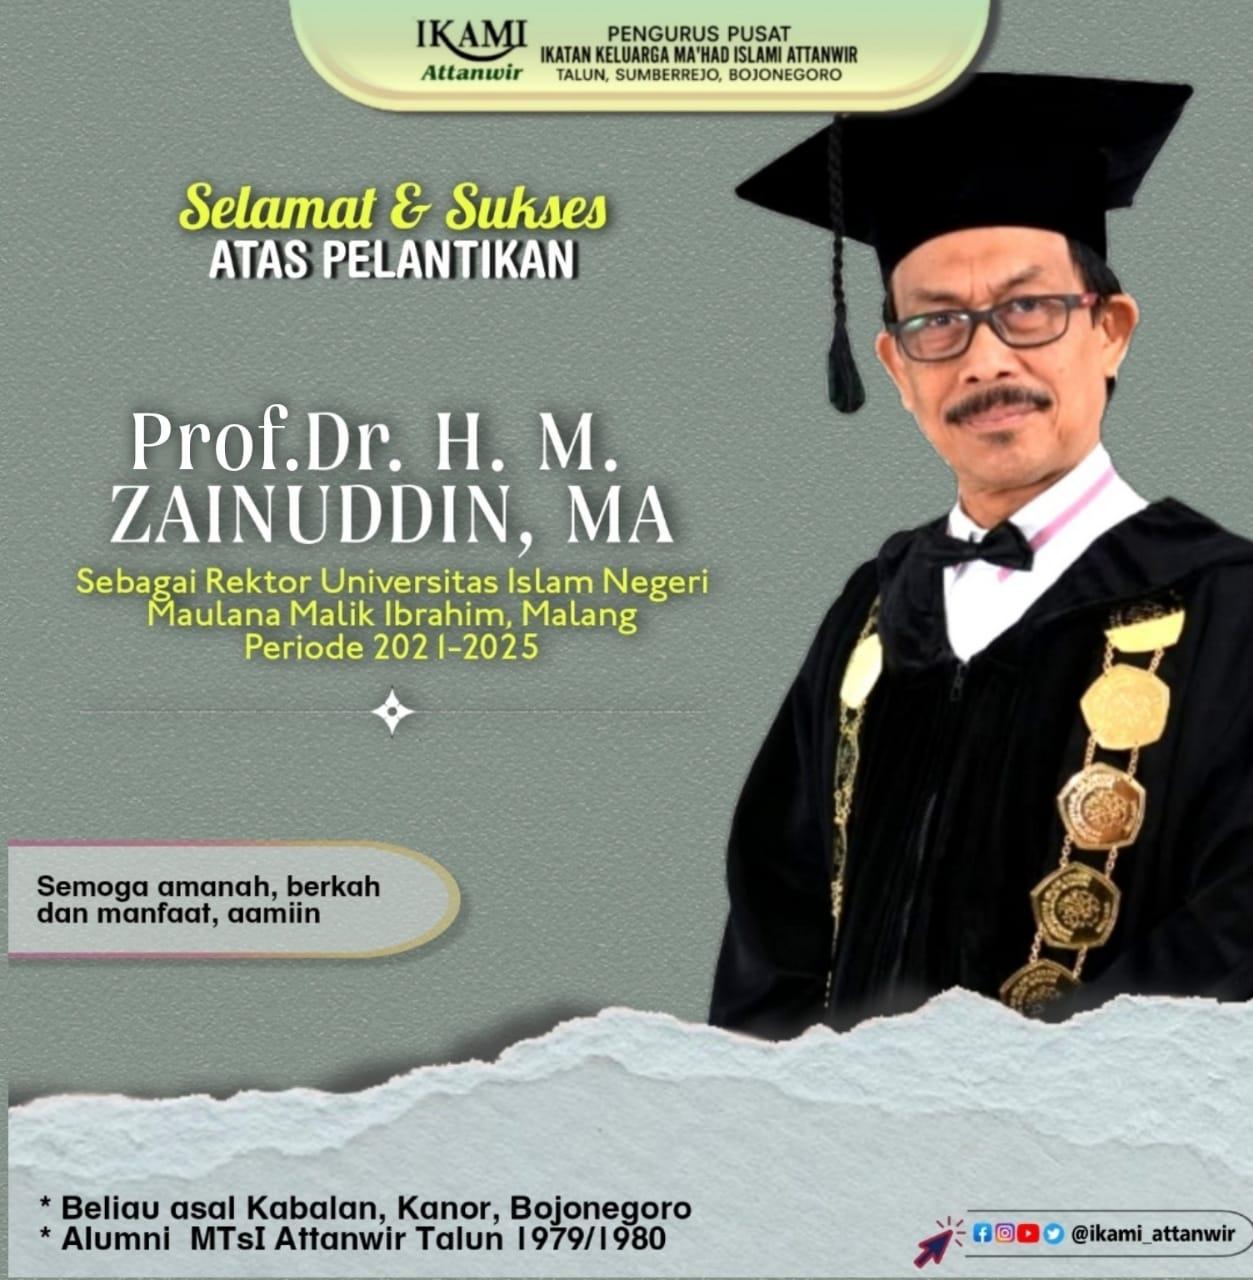 Putra Daerah Bojonegoro, Prof Zainuddin Resmi Jabat Rektor UIN Malang